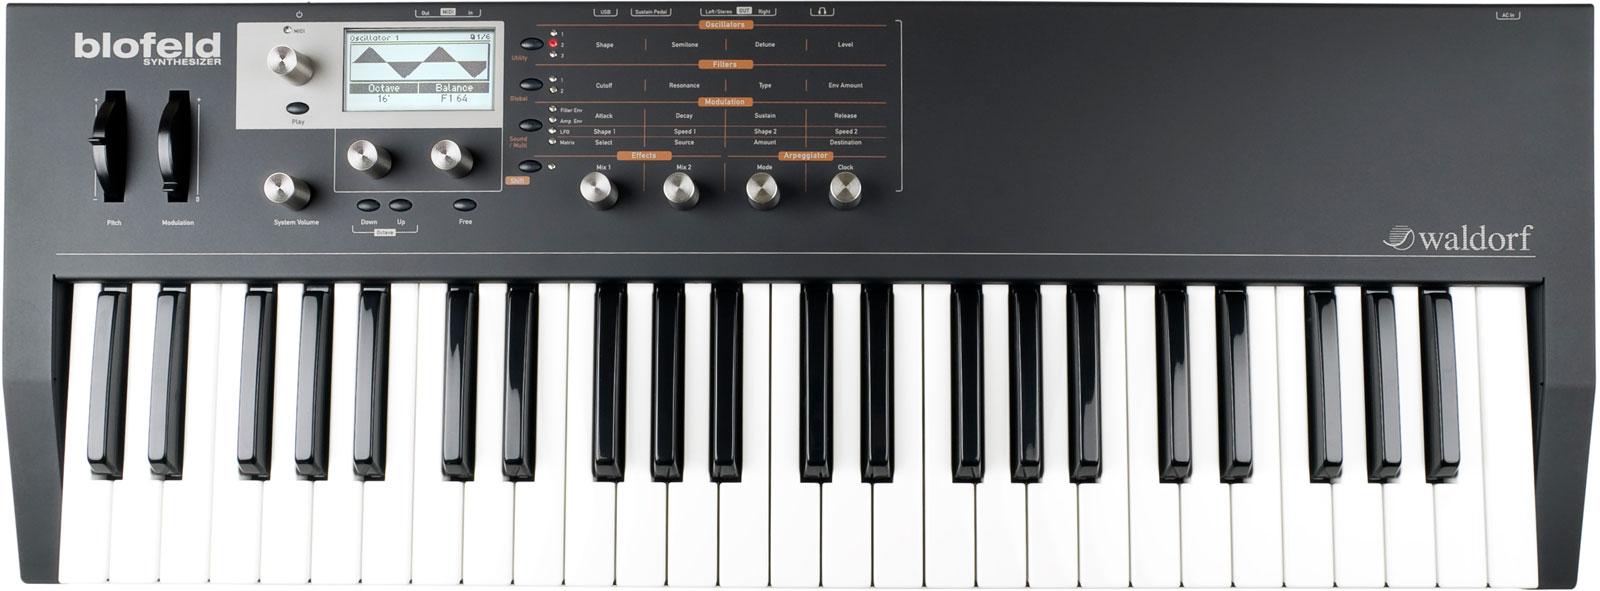 http://medias.audiofanzine.com/images/normal/waldorf-blofeld-keyboard-black-edition-451116.jpg